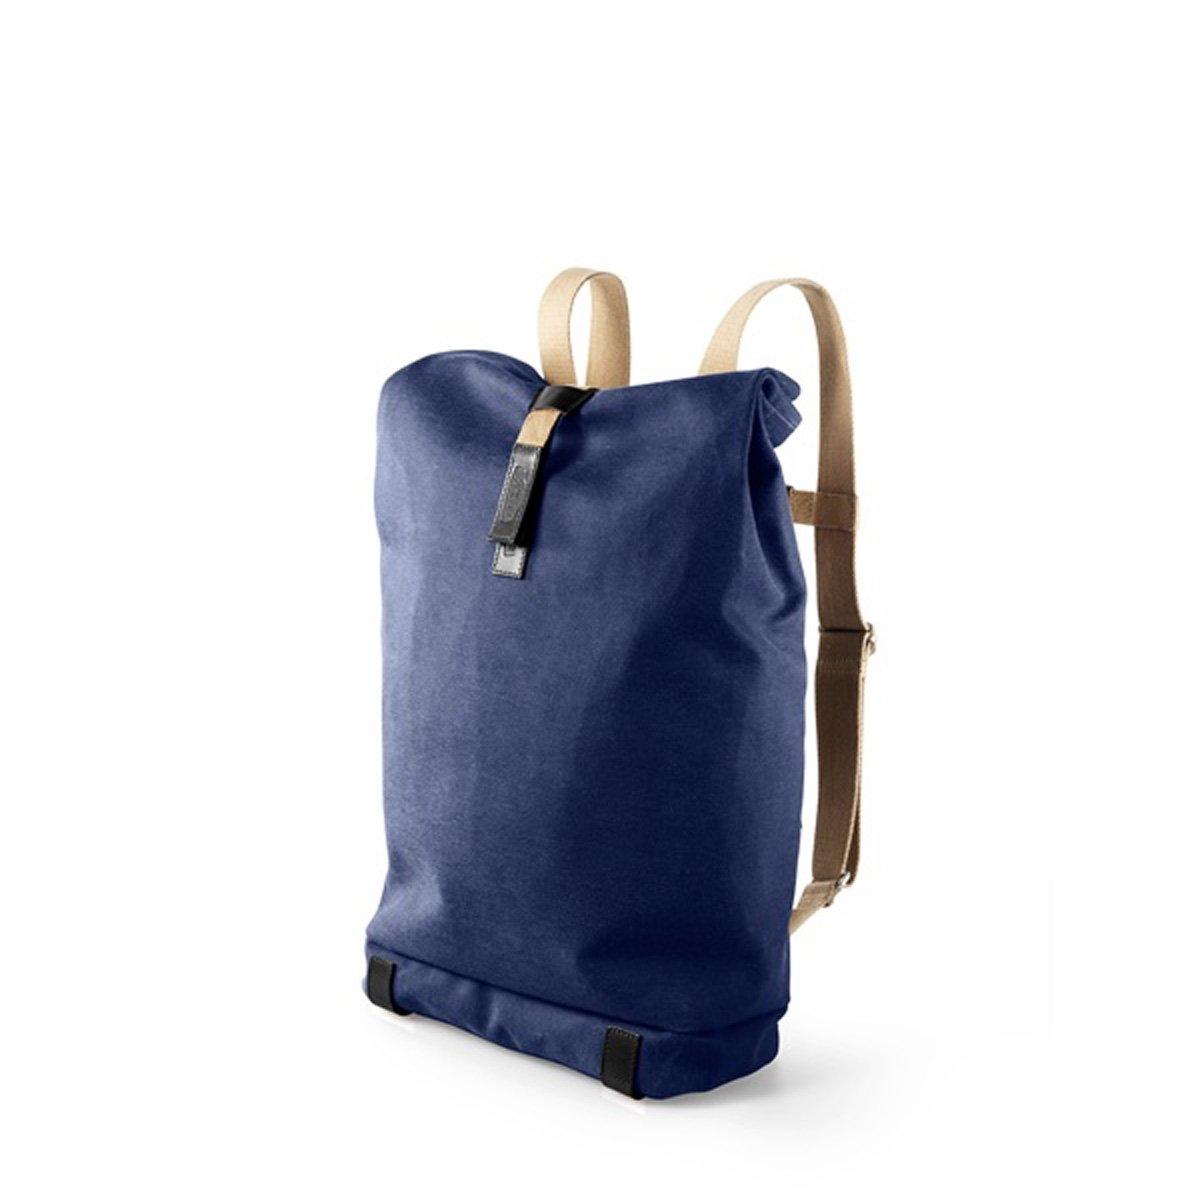 341f2aa9dd9 Brooks Pickwick Backpack - -: Amazon.co.uk: Clothing